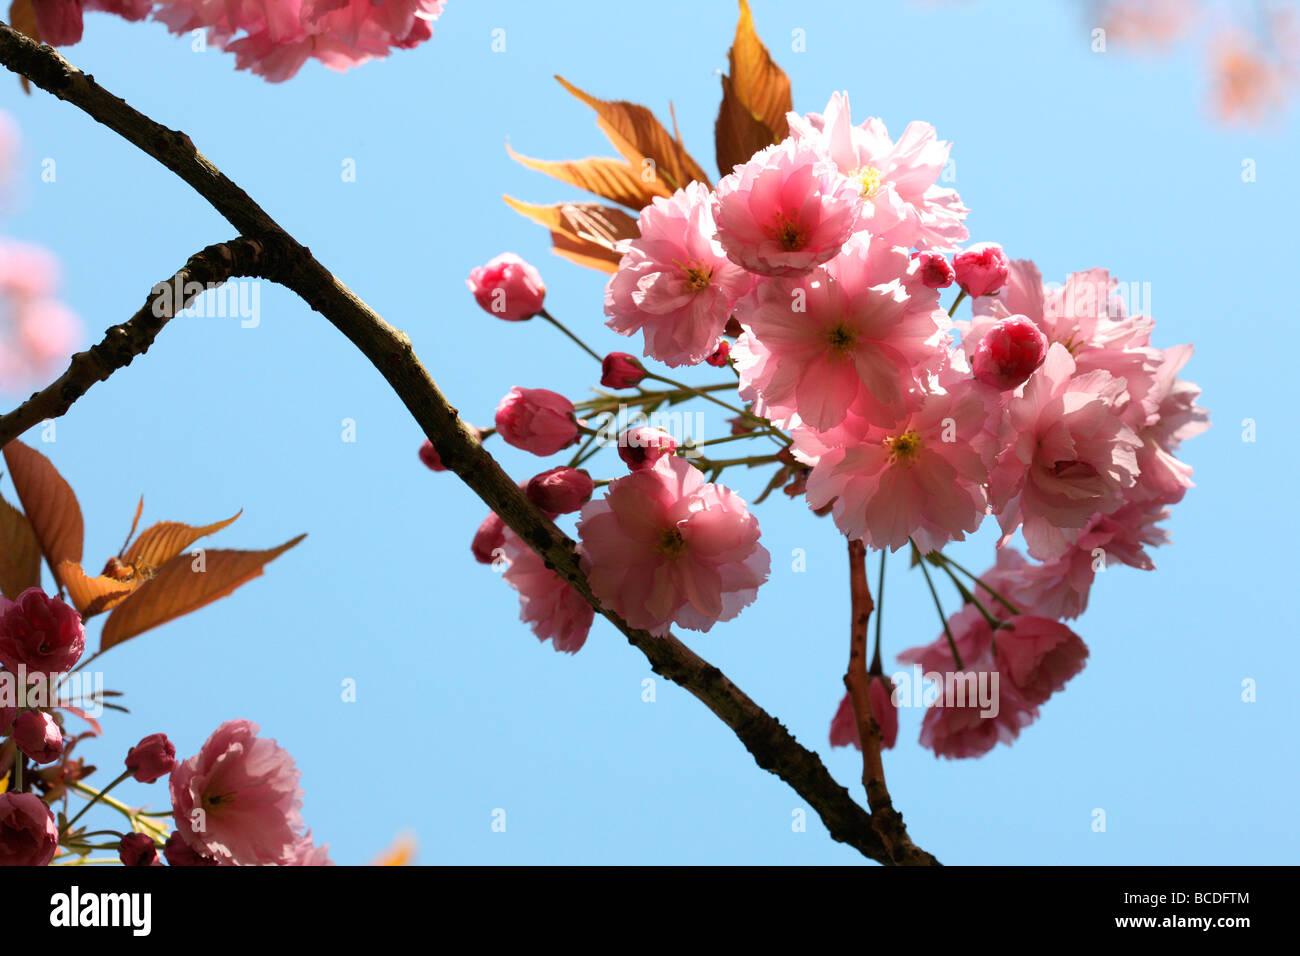 a taste of spring prunus cherry blossom fine art photography Jane Ann Butler Photography JABP453 - Stock Image